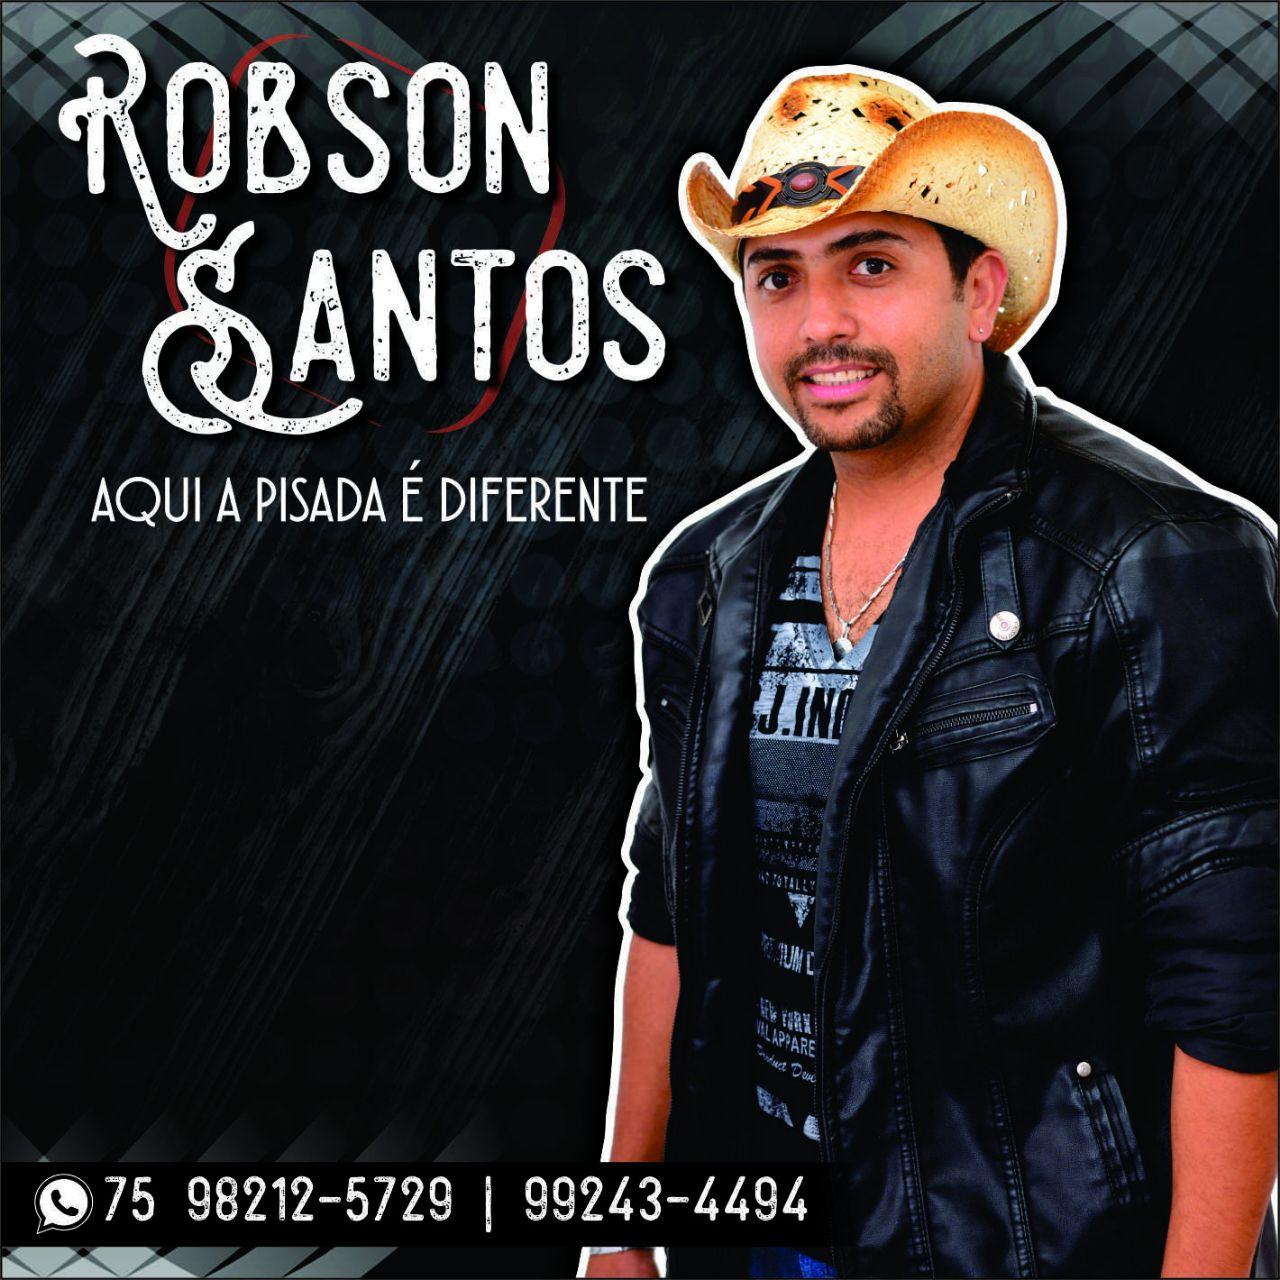 ROBSON SANTOS